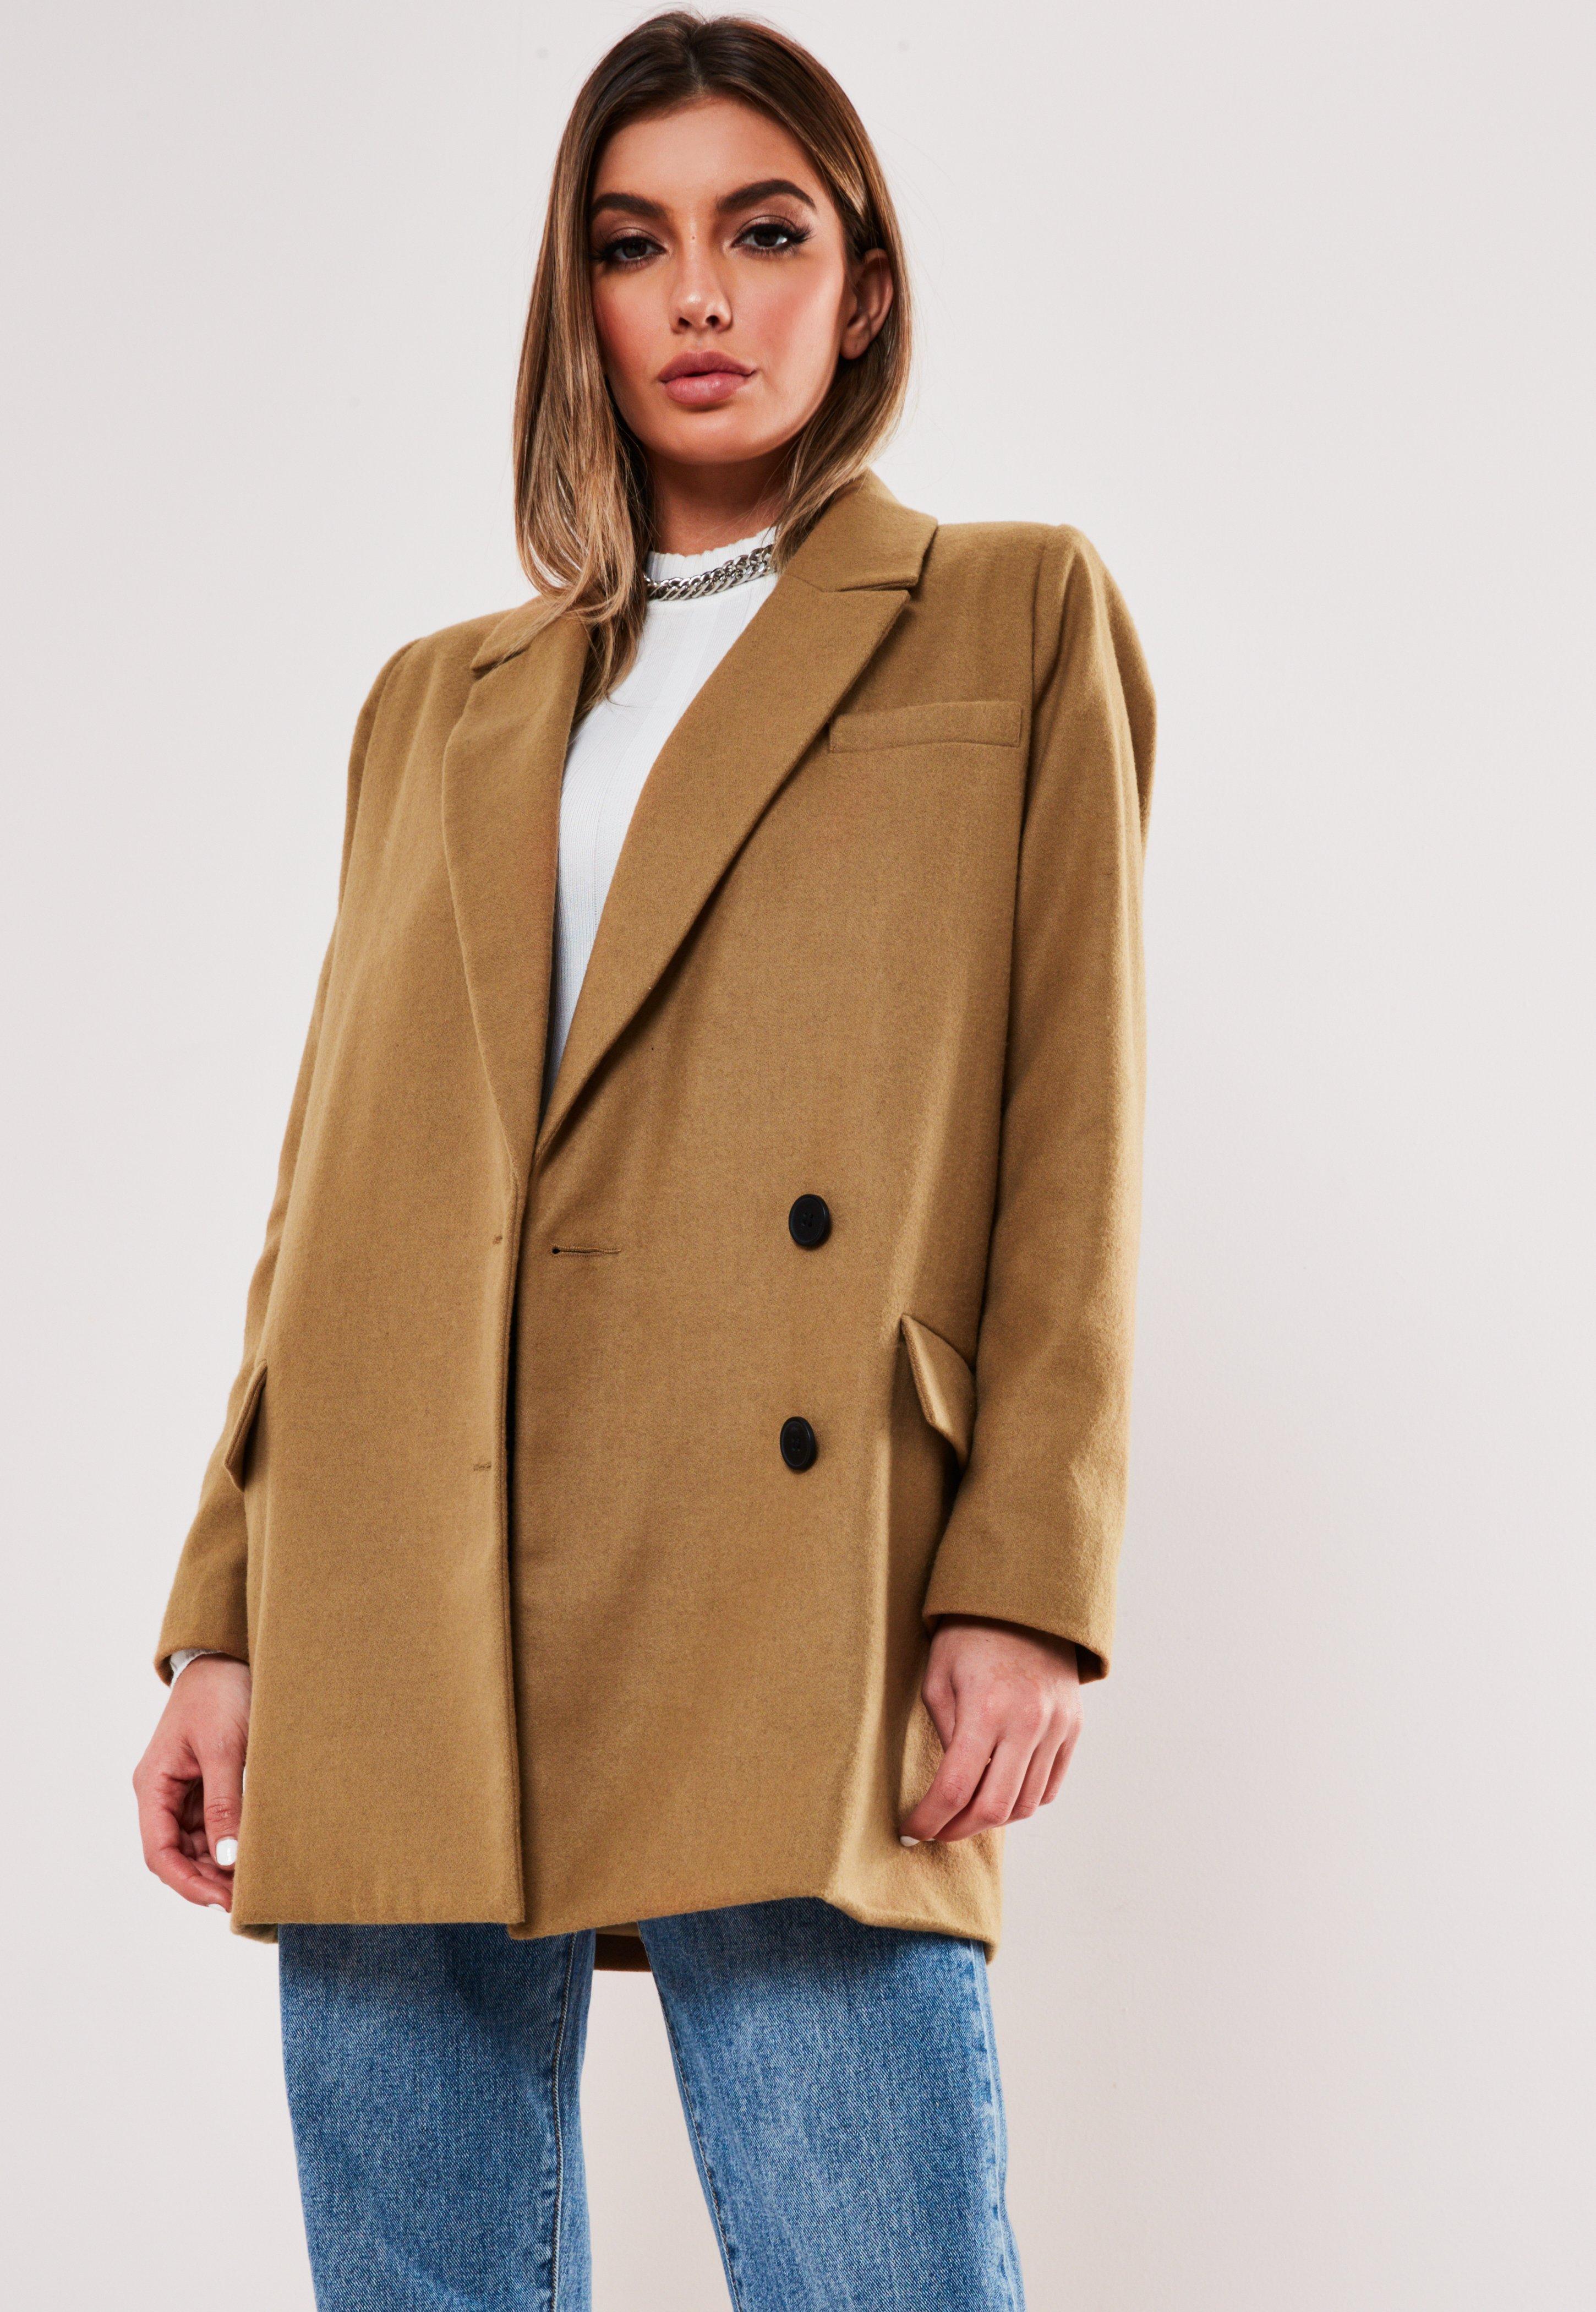 Grey Oversized Boyfriend Blazer Coat